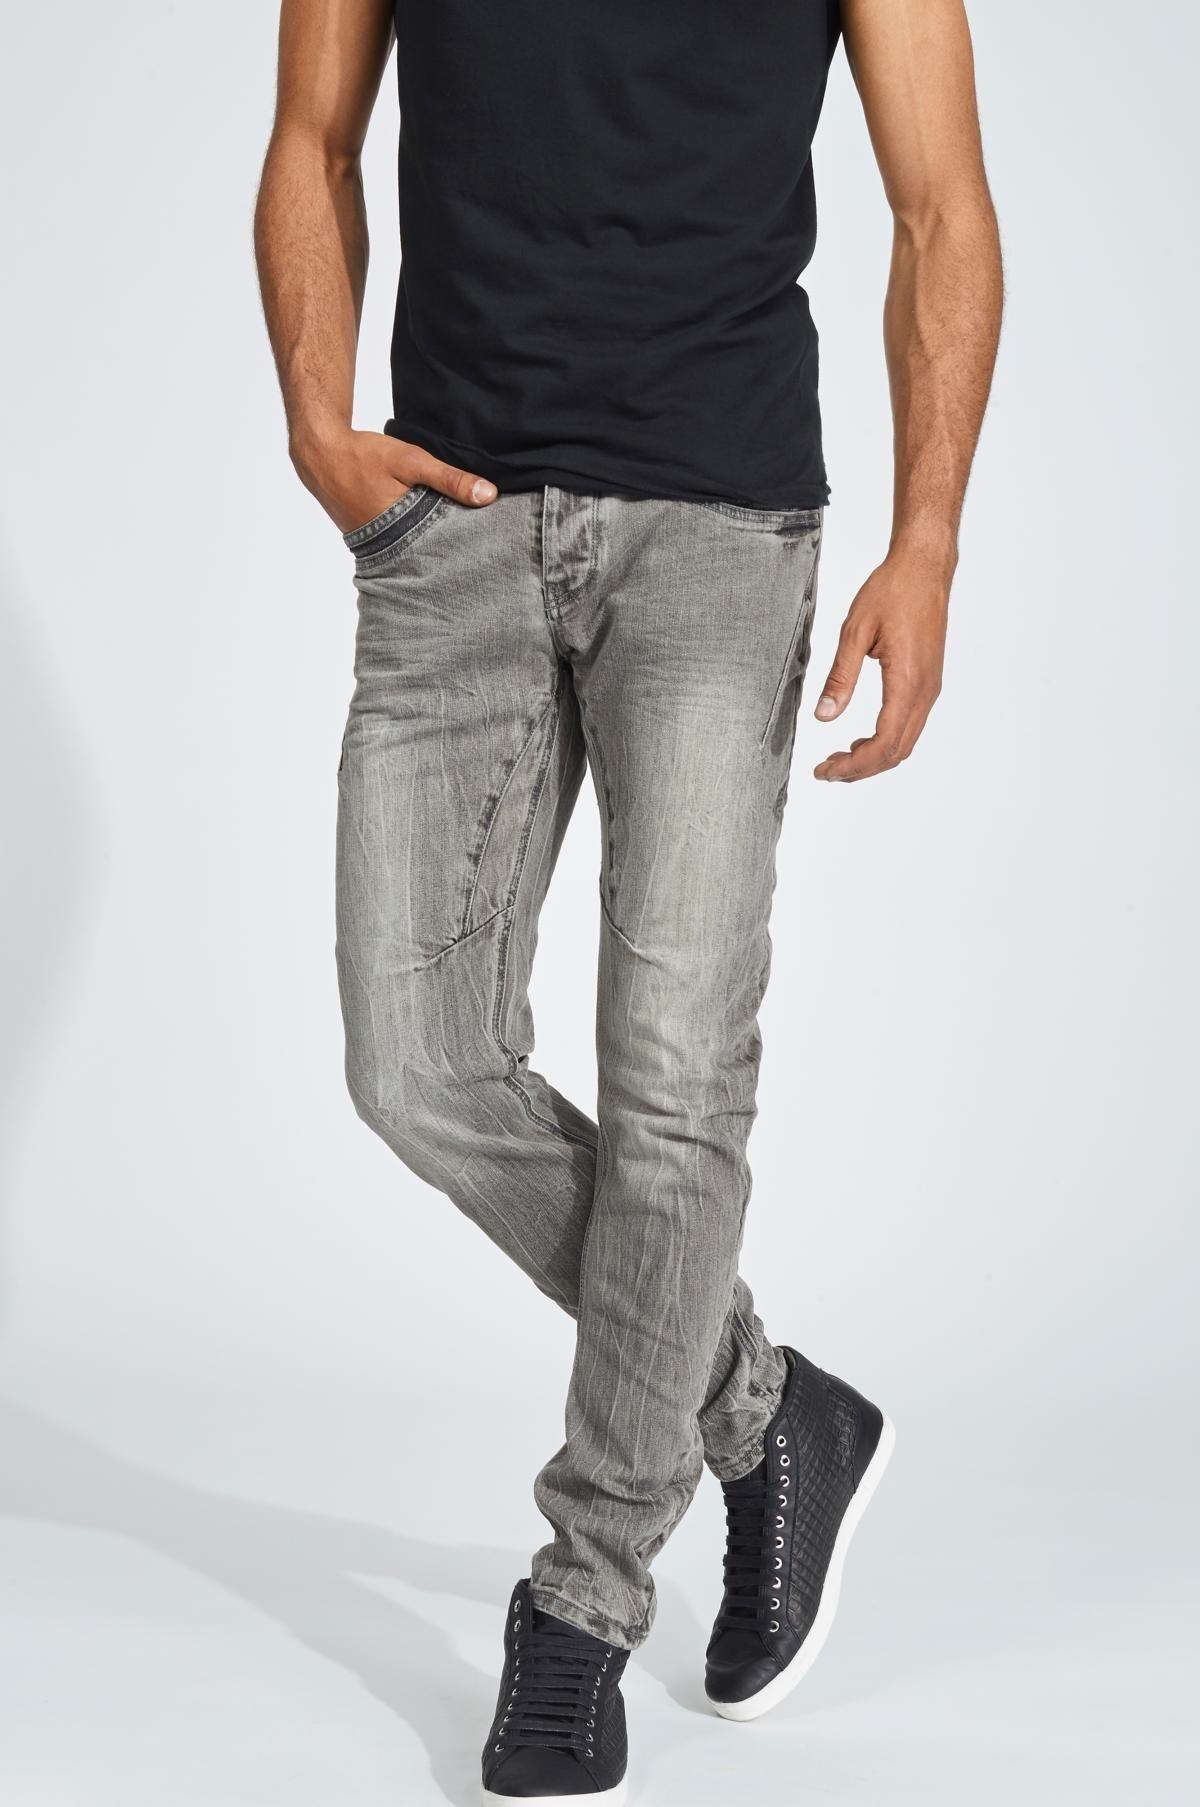 Herren trueprodigy Tapered-fit-Jeans Vex #601 blau, grau | 04057124021714